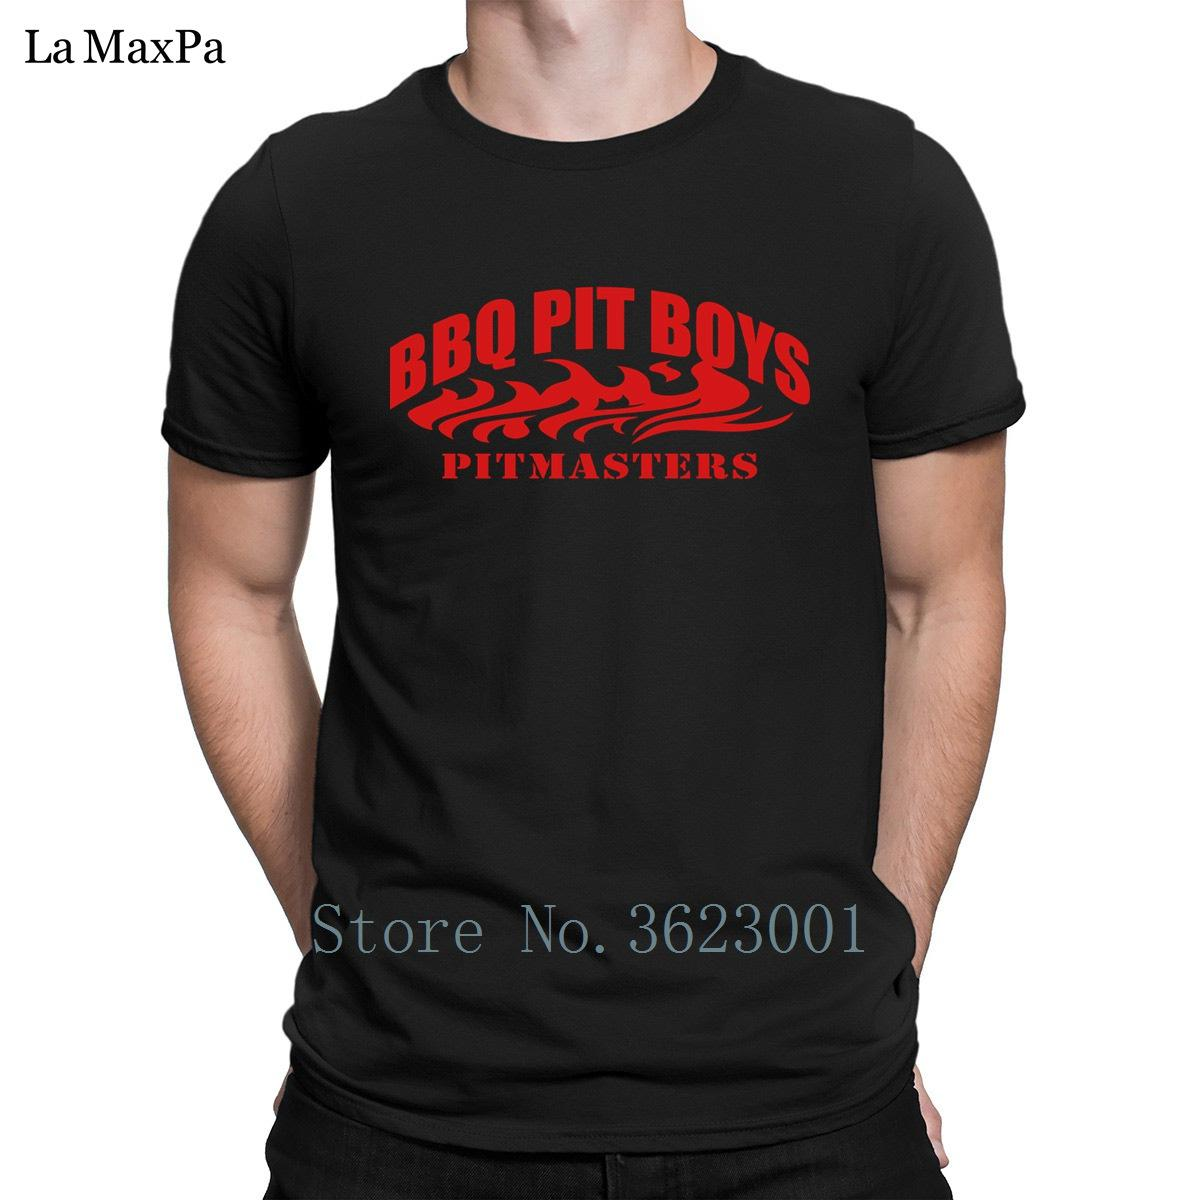 Design New Fashion T Shirt Bbq Pit Boys Pitmasters Men Tee Shirt Clothes  T-Shirt For Men Unique Tshirt Man Round Collar Fitness